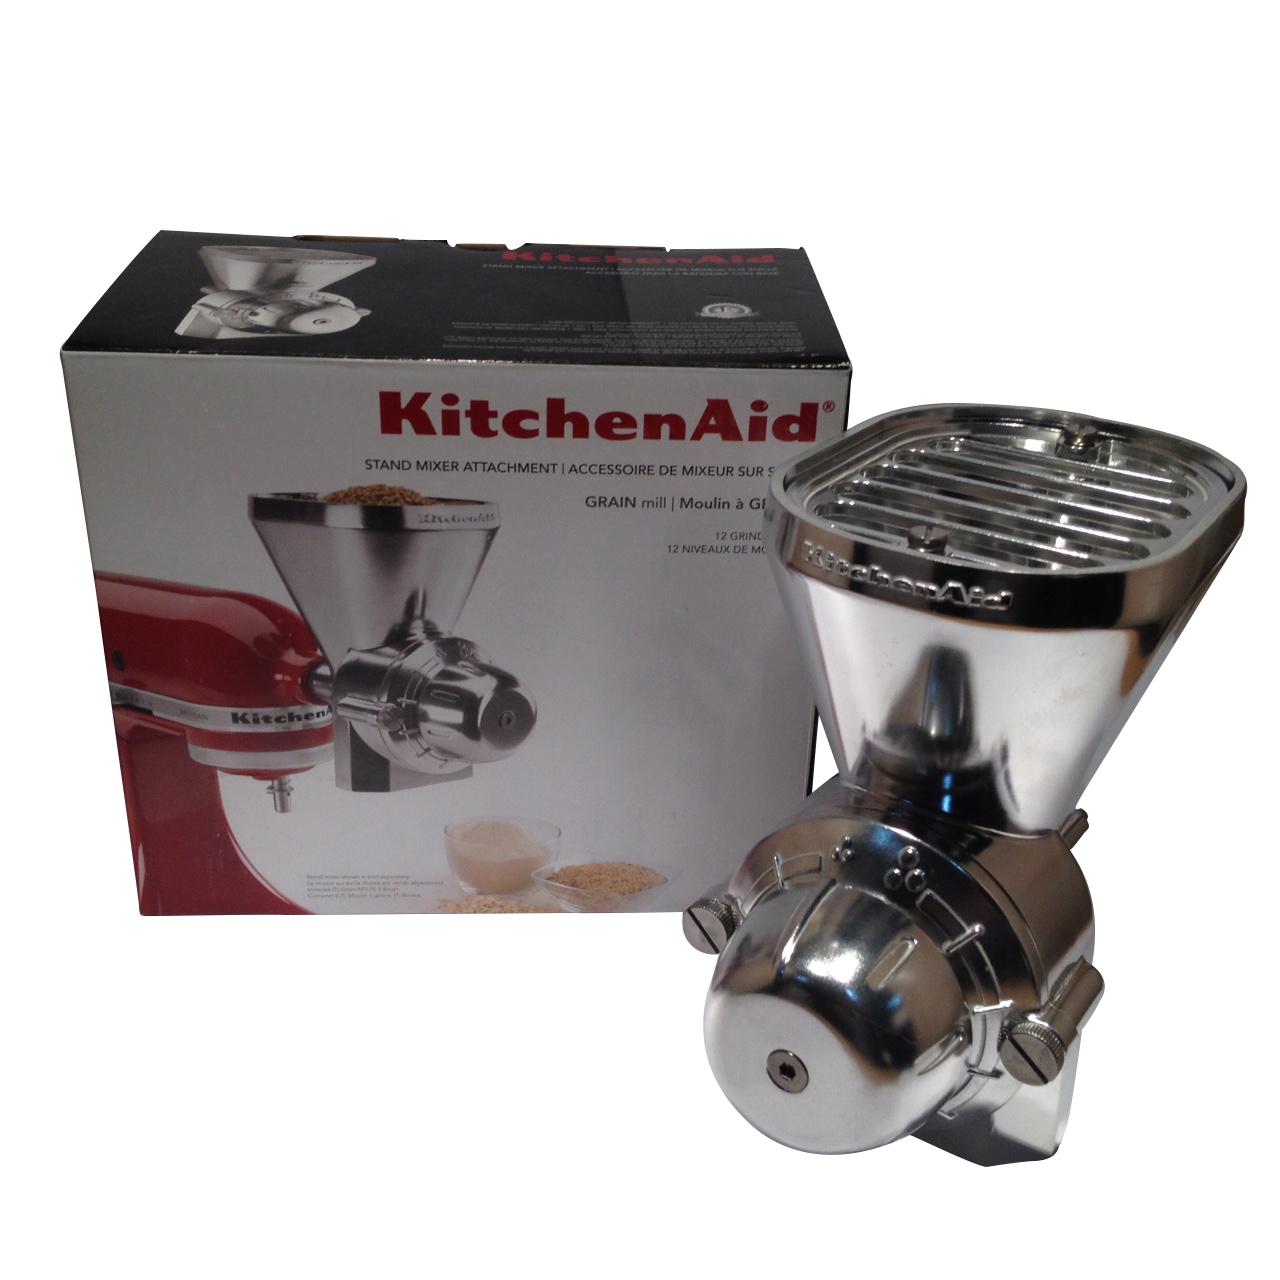 kitchen aid bowls counter organizer kitchenaid stand mixer grain mill attachment kgm w10318099 ...